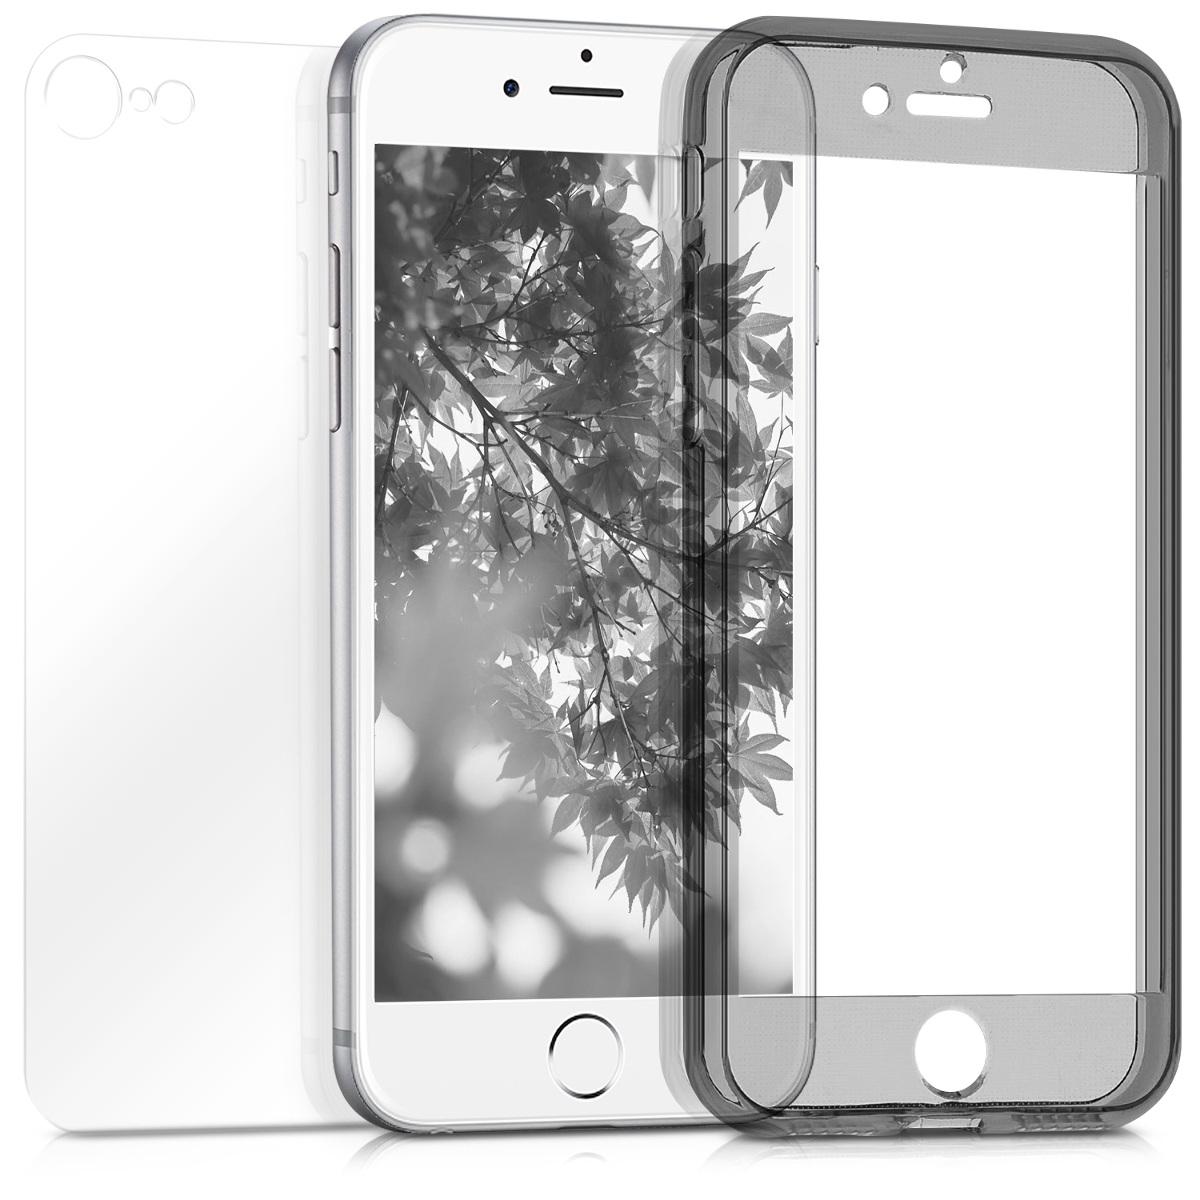 KW Θήκη Full Body iPhone 8 / 7 - Black / Transparent (43753.01)